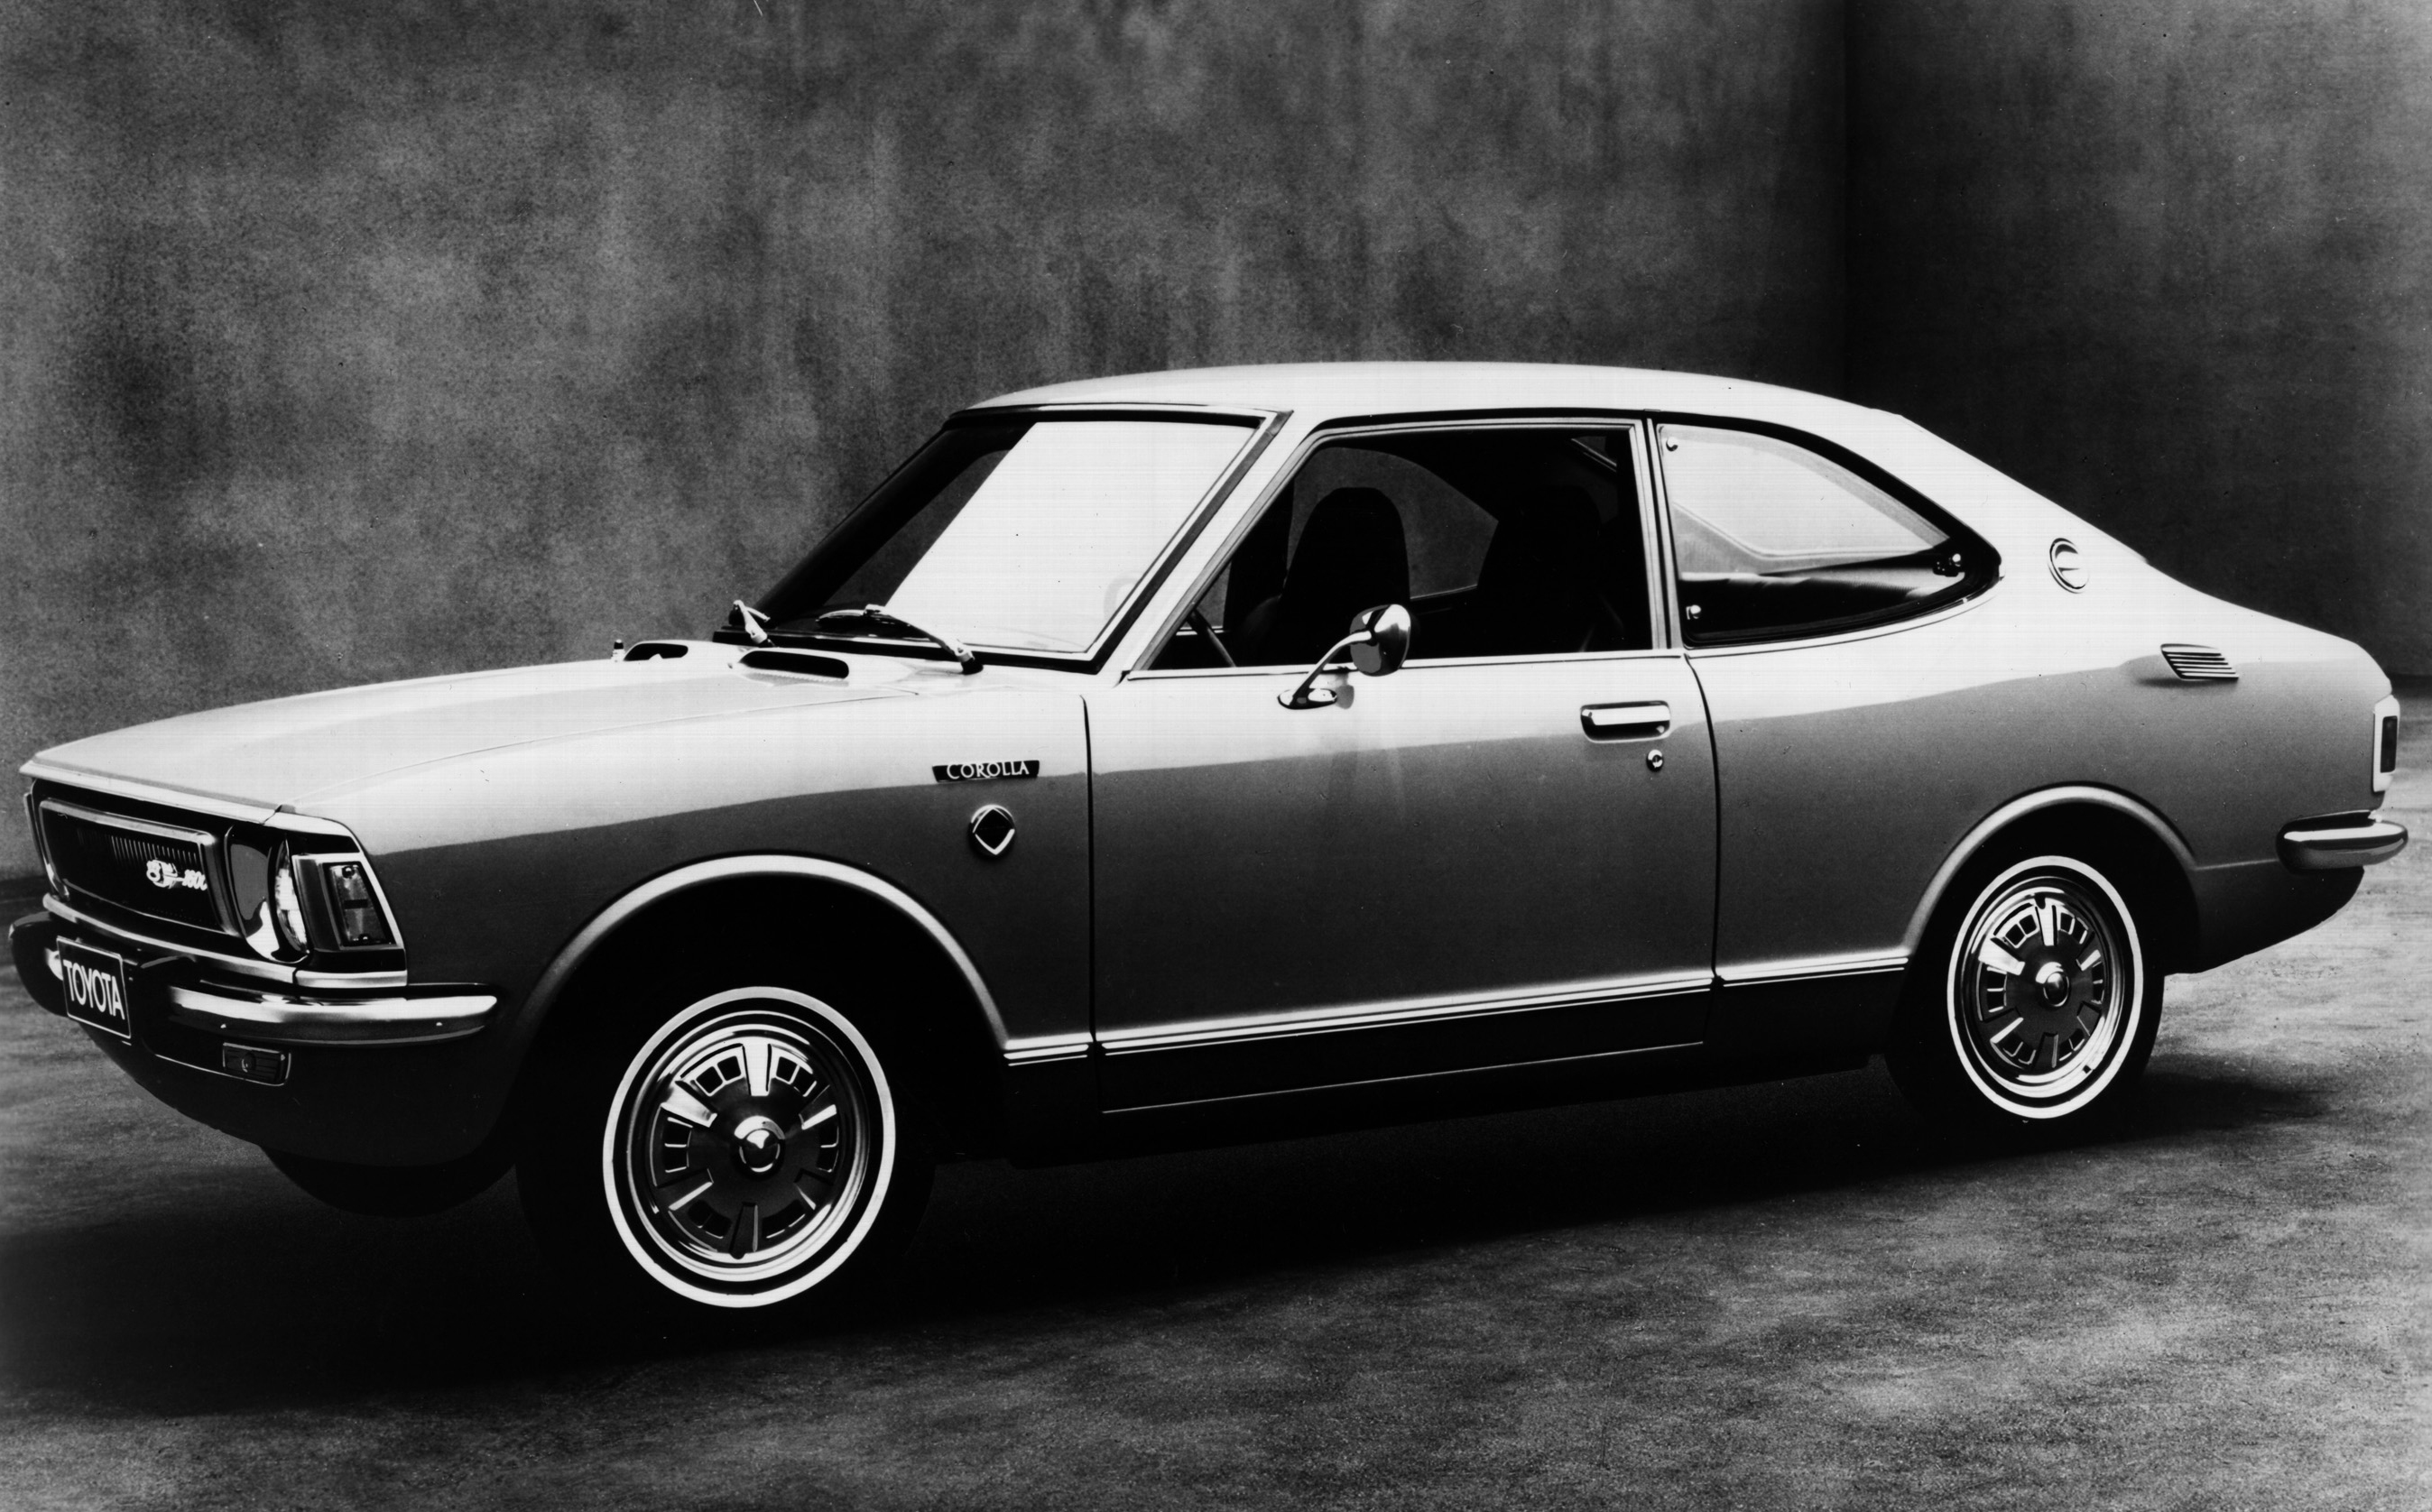 1998001_1972_Corolla_1600_Fastback-1